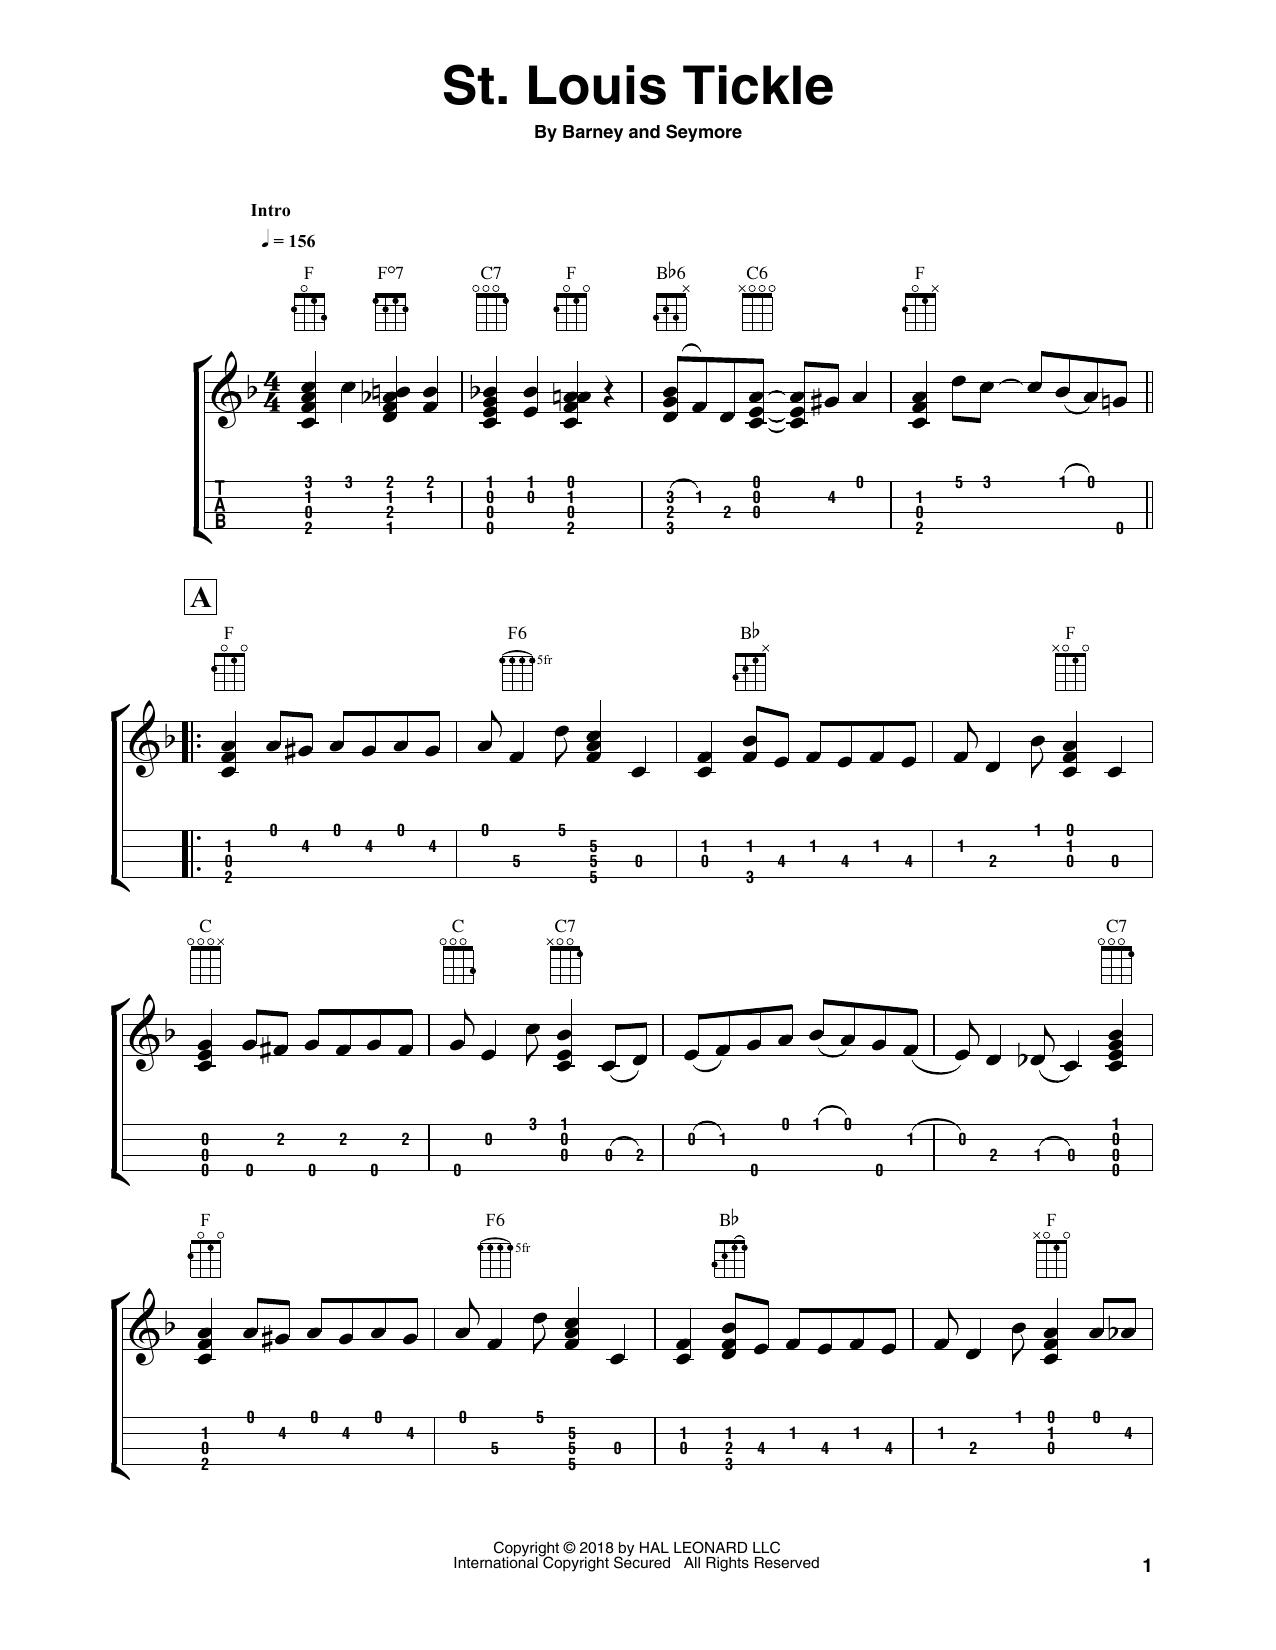 St. Louis Tickle Sheet Music